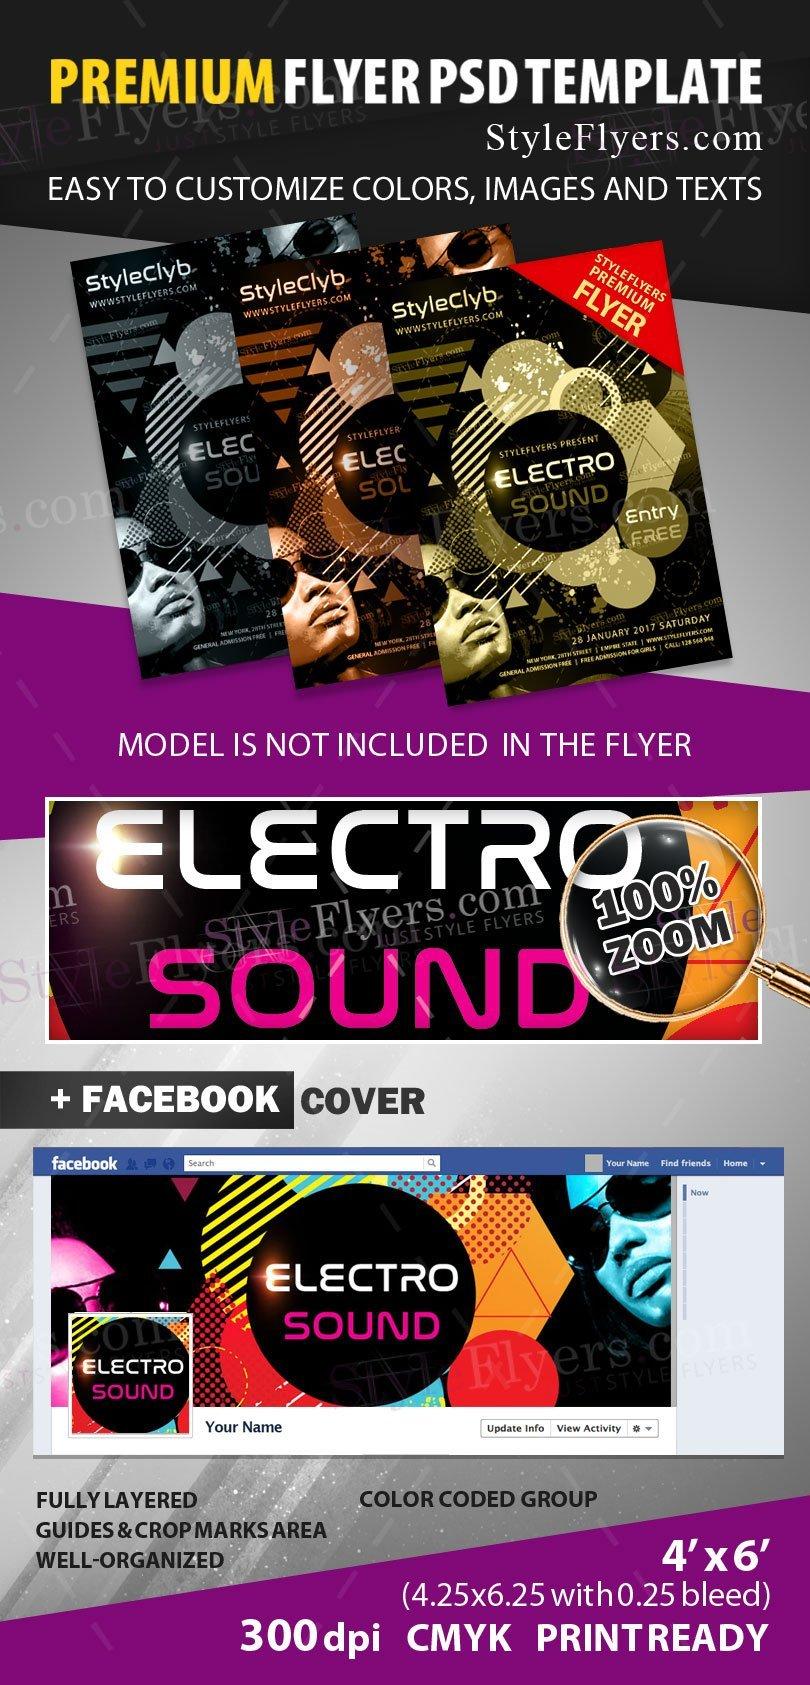 electro-sound-preview_premium